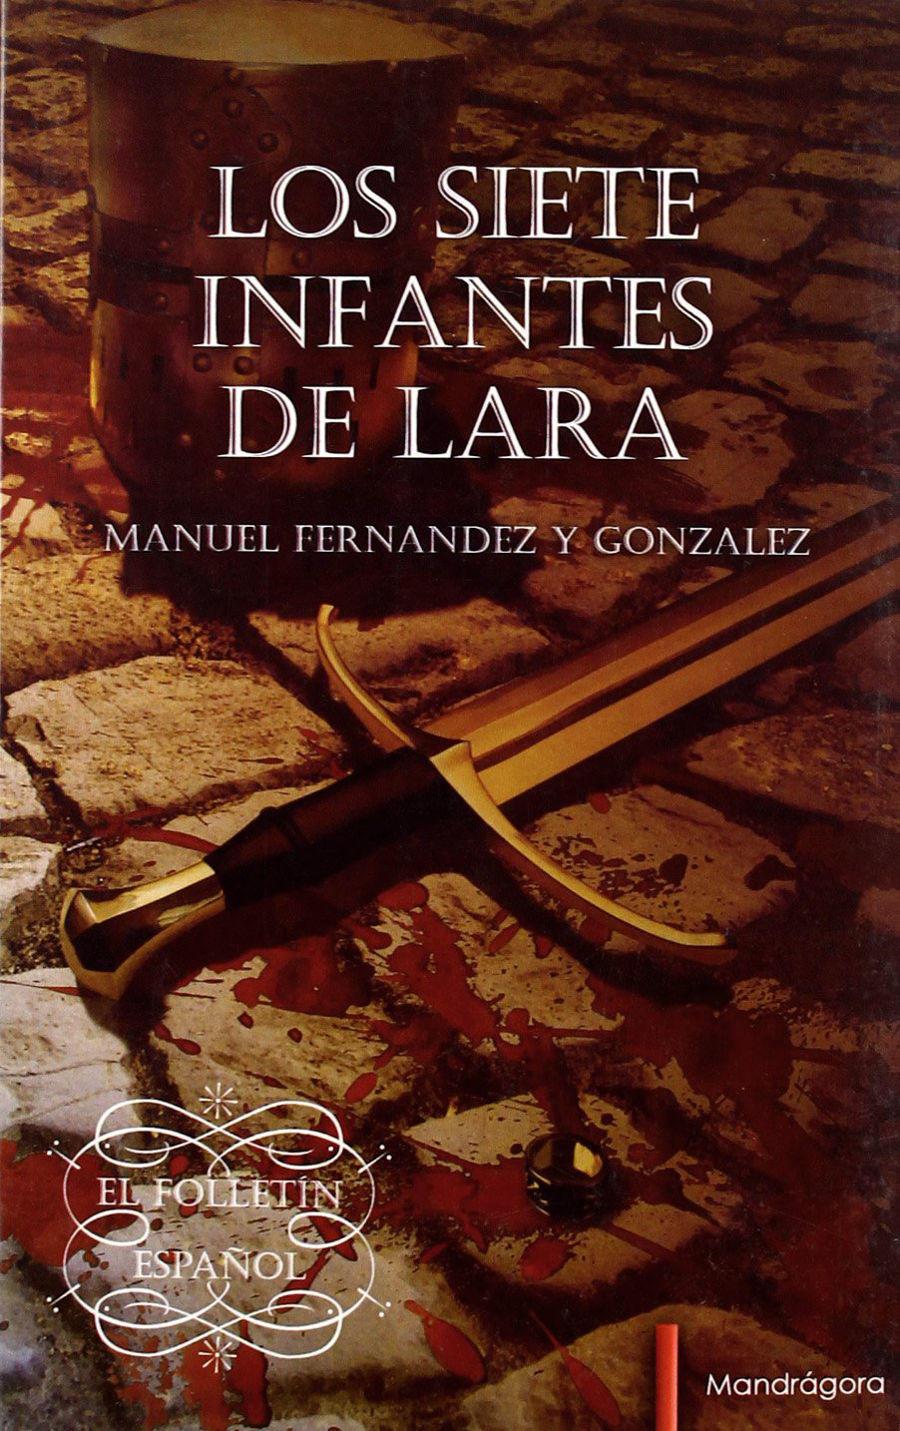 Los siete infantes de Lara Book Cover